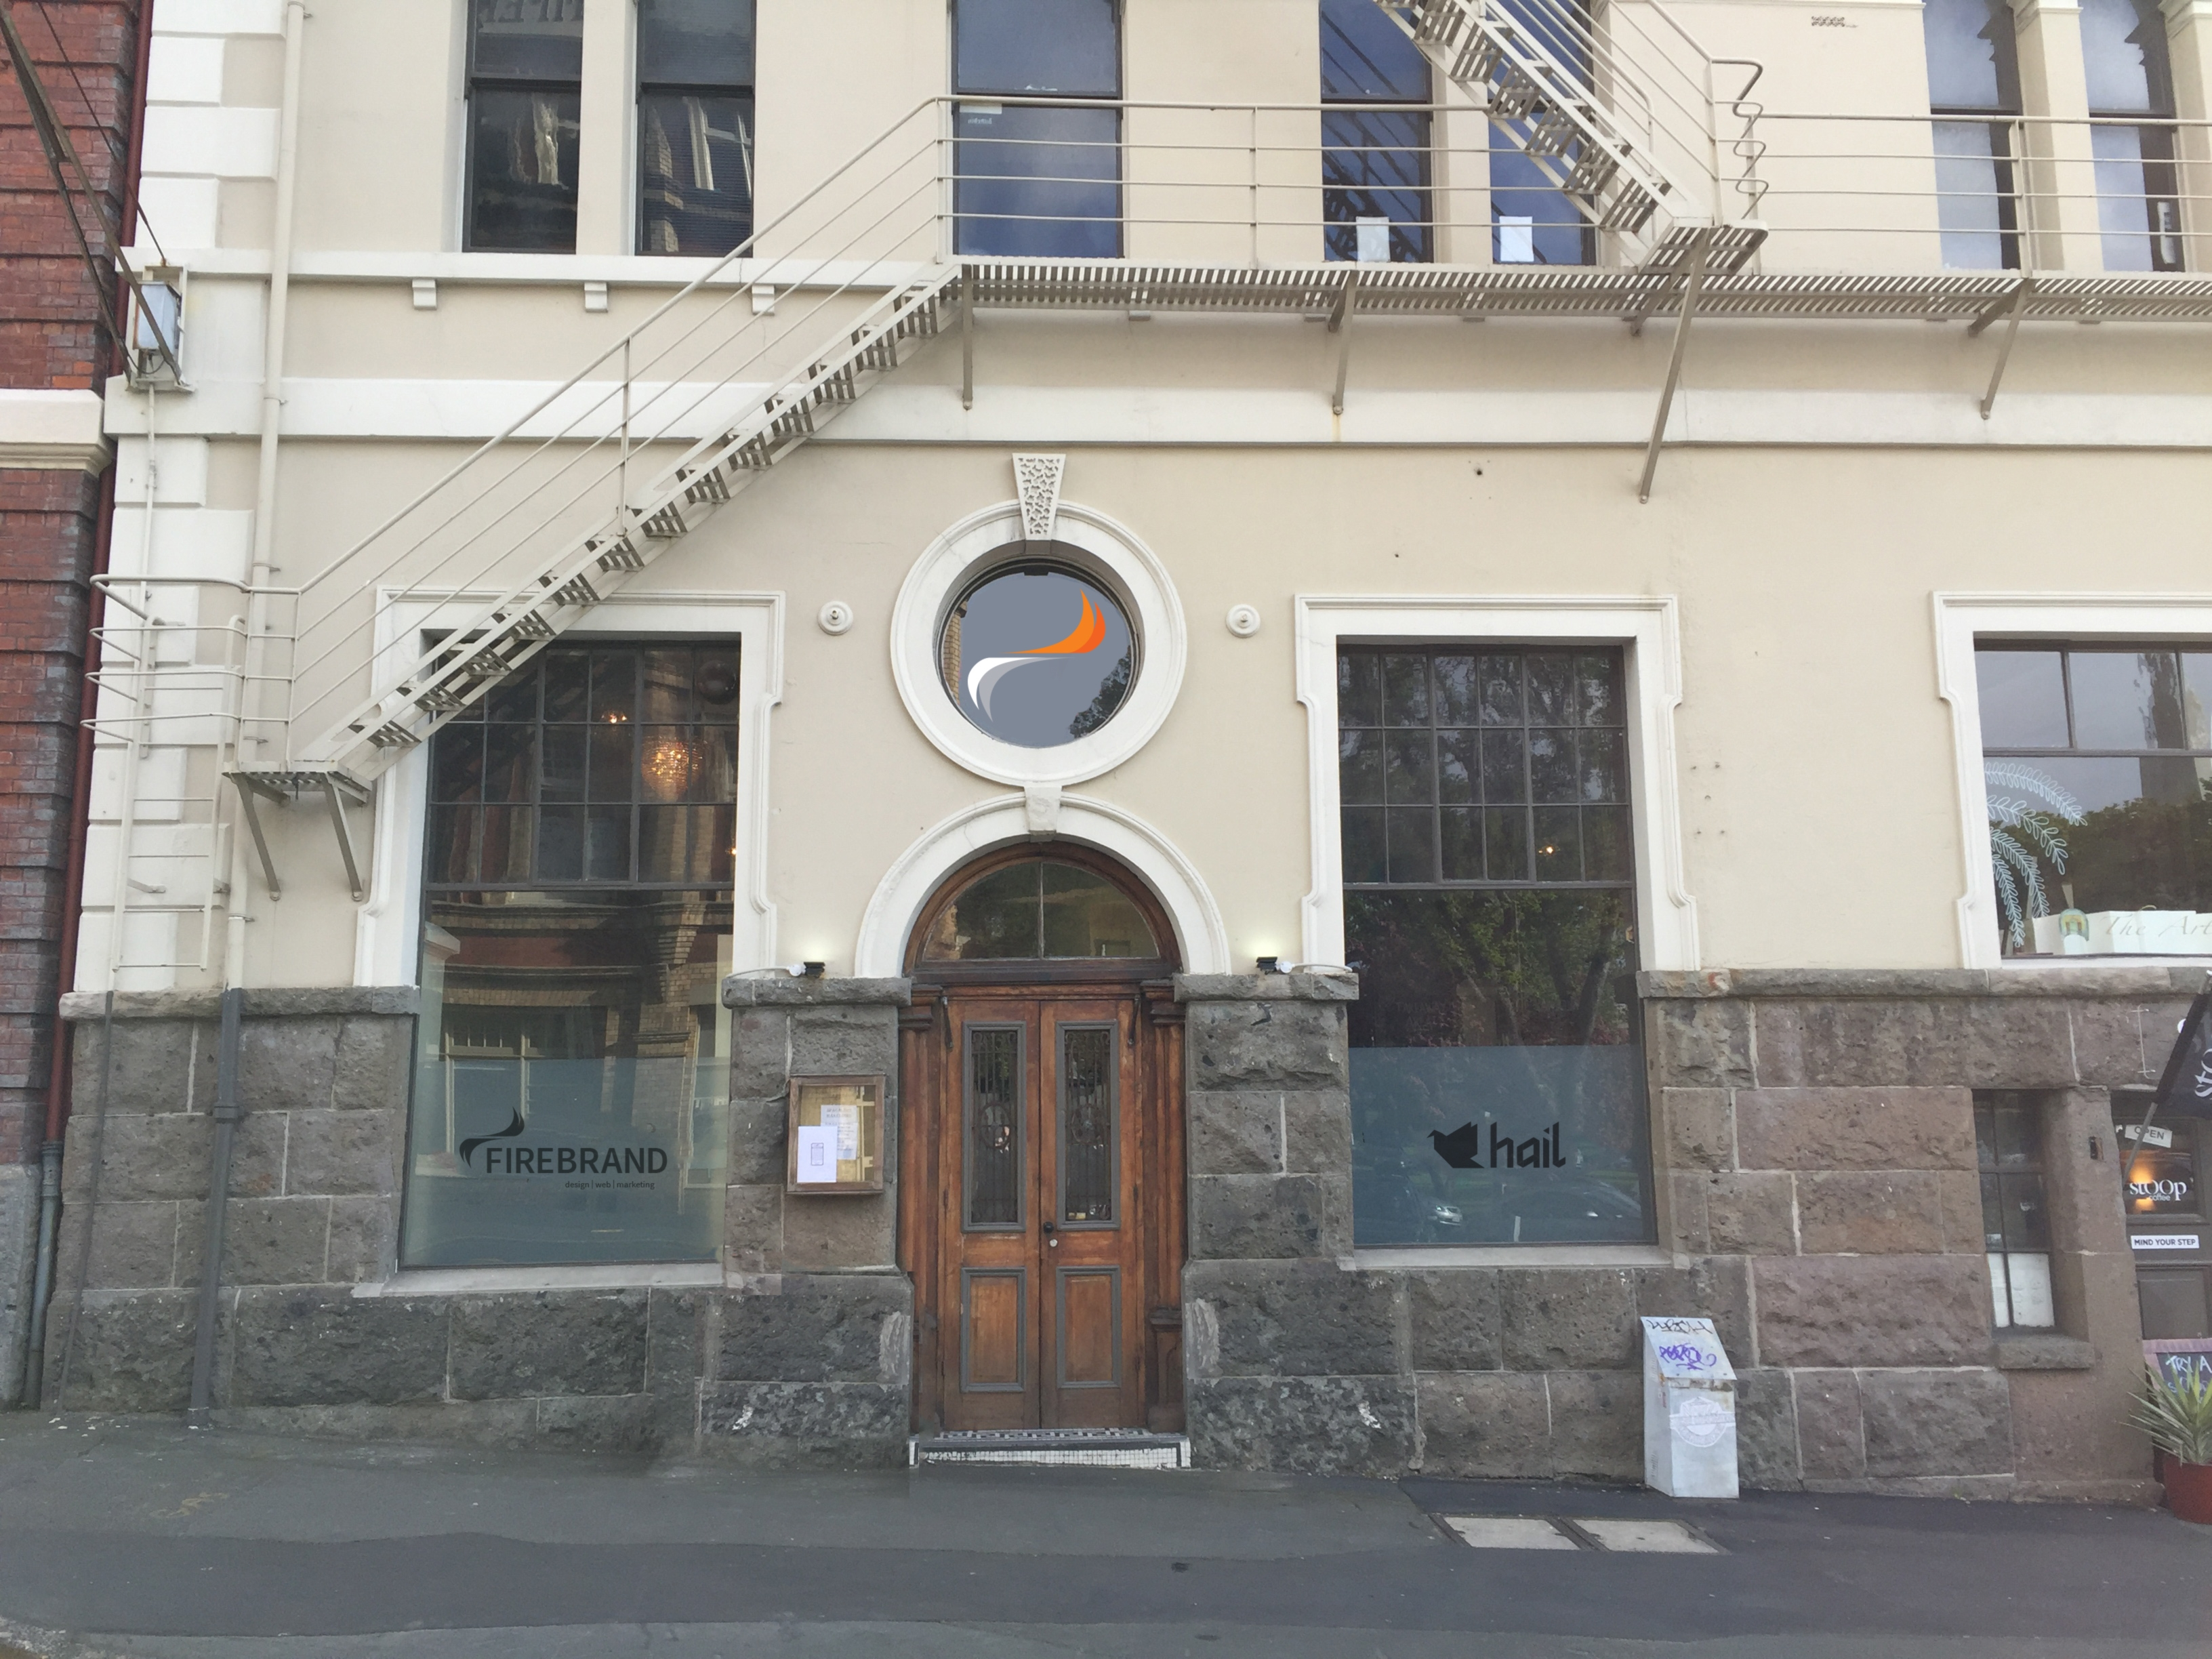 4 Dowling St - Firebrand & Hail Studio